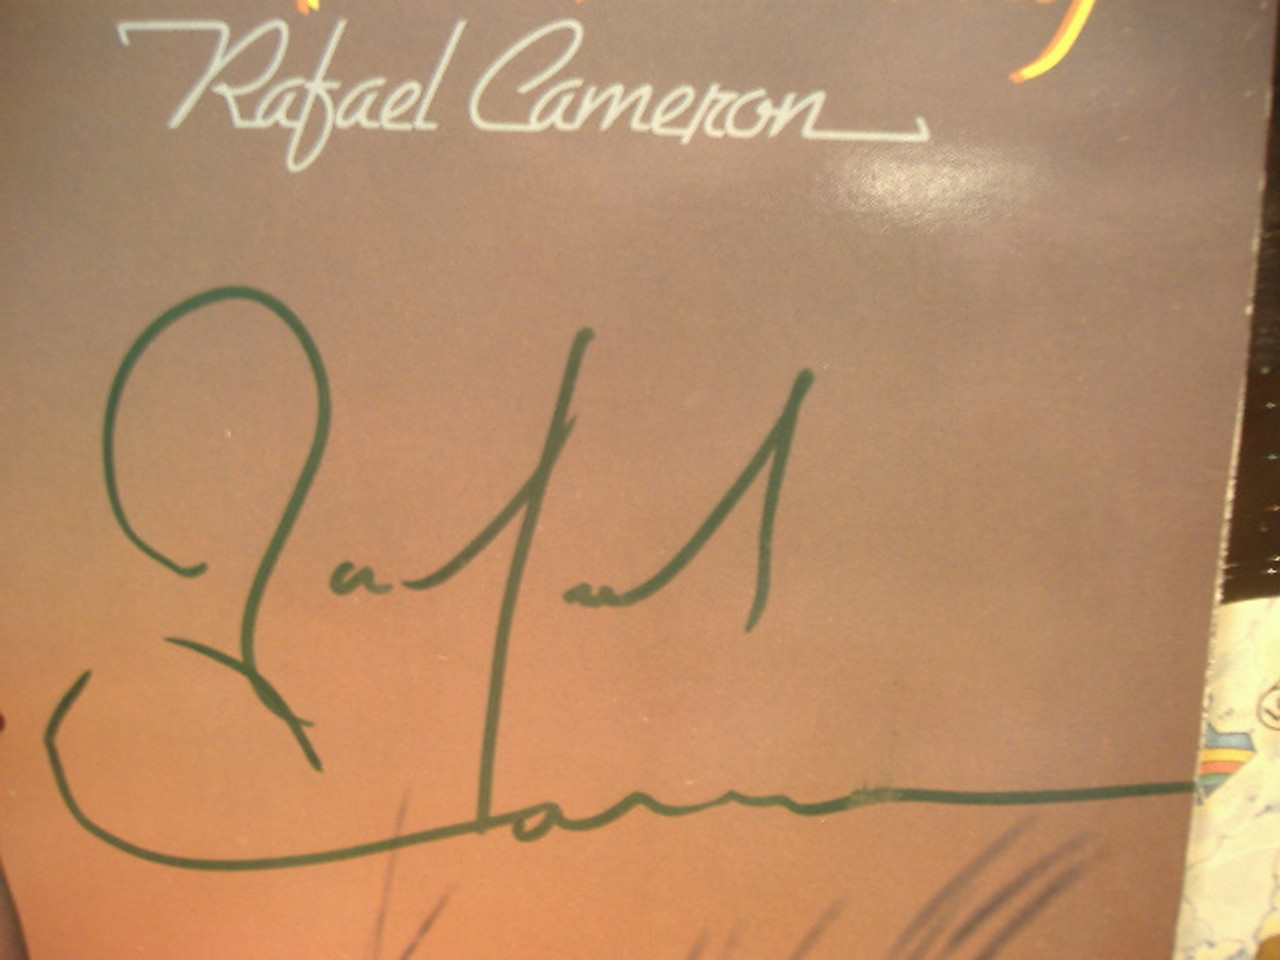 Cameron, Rafael LP Signed Autograph Cameron All The Way